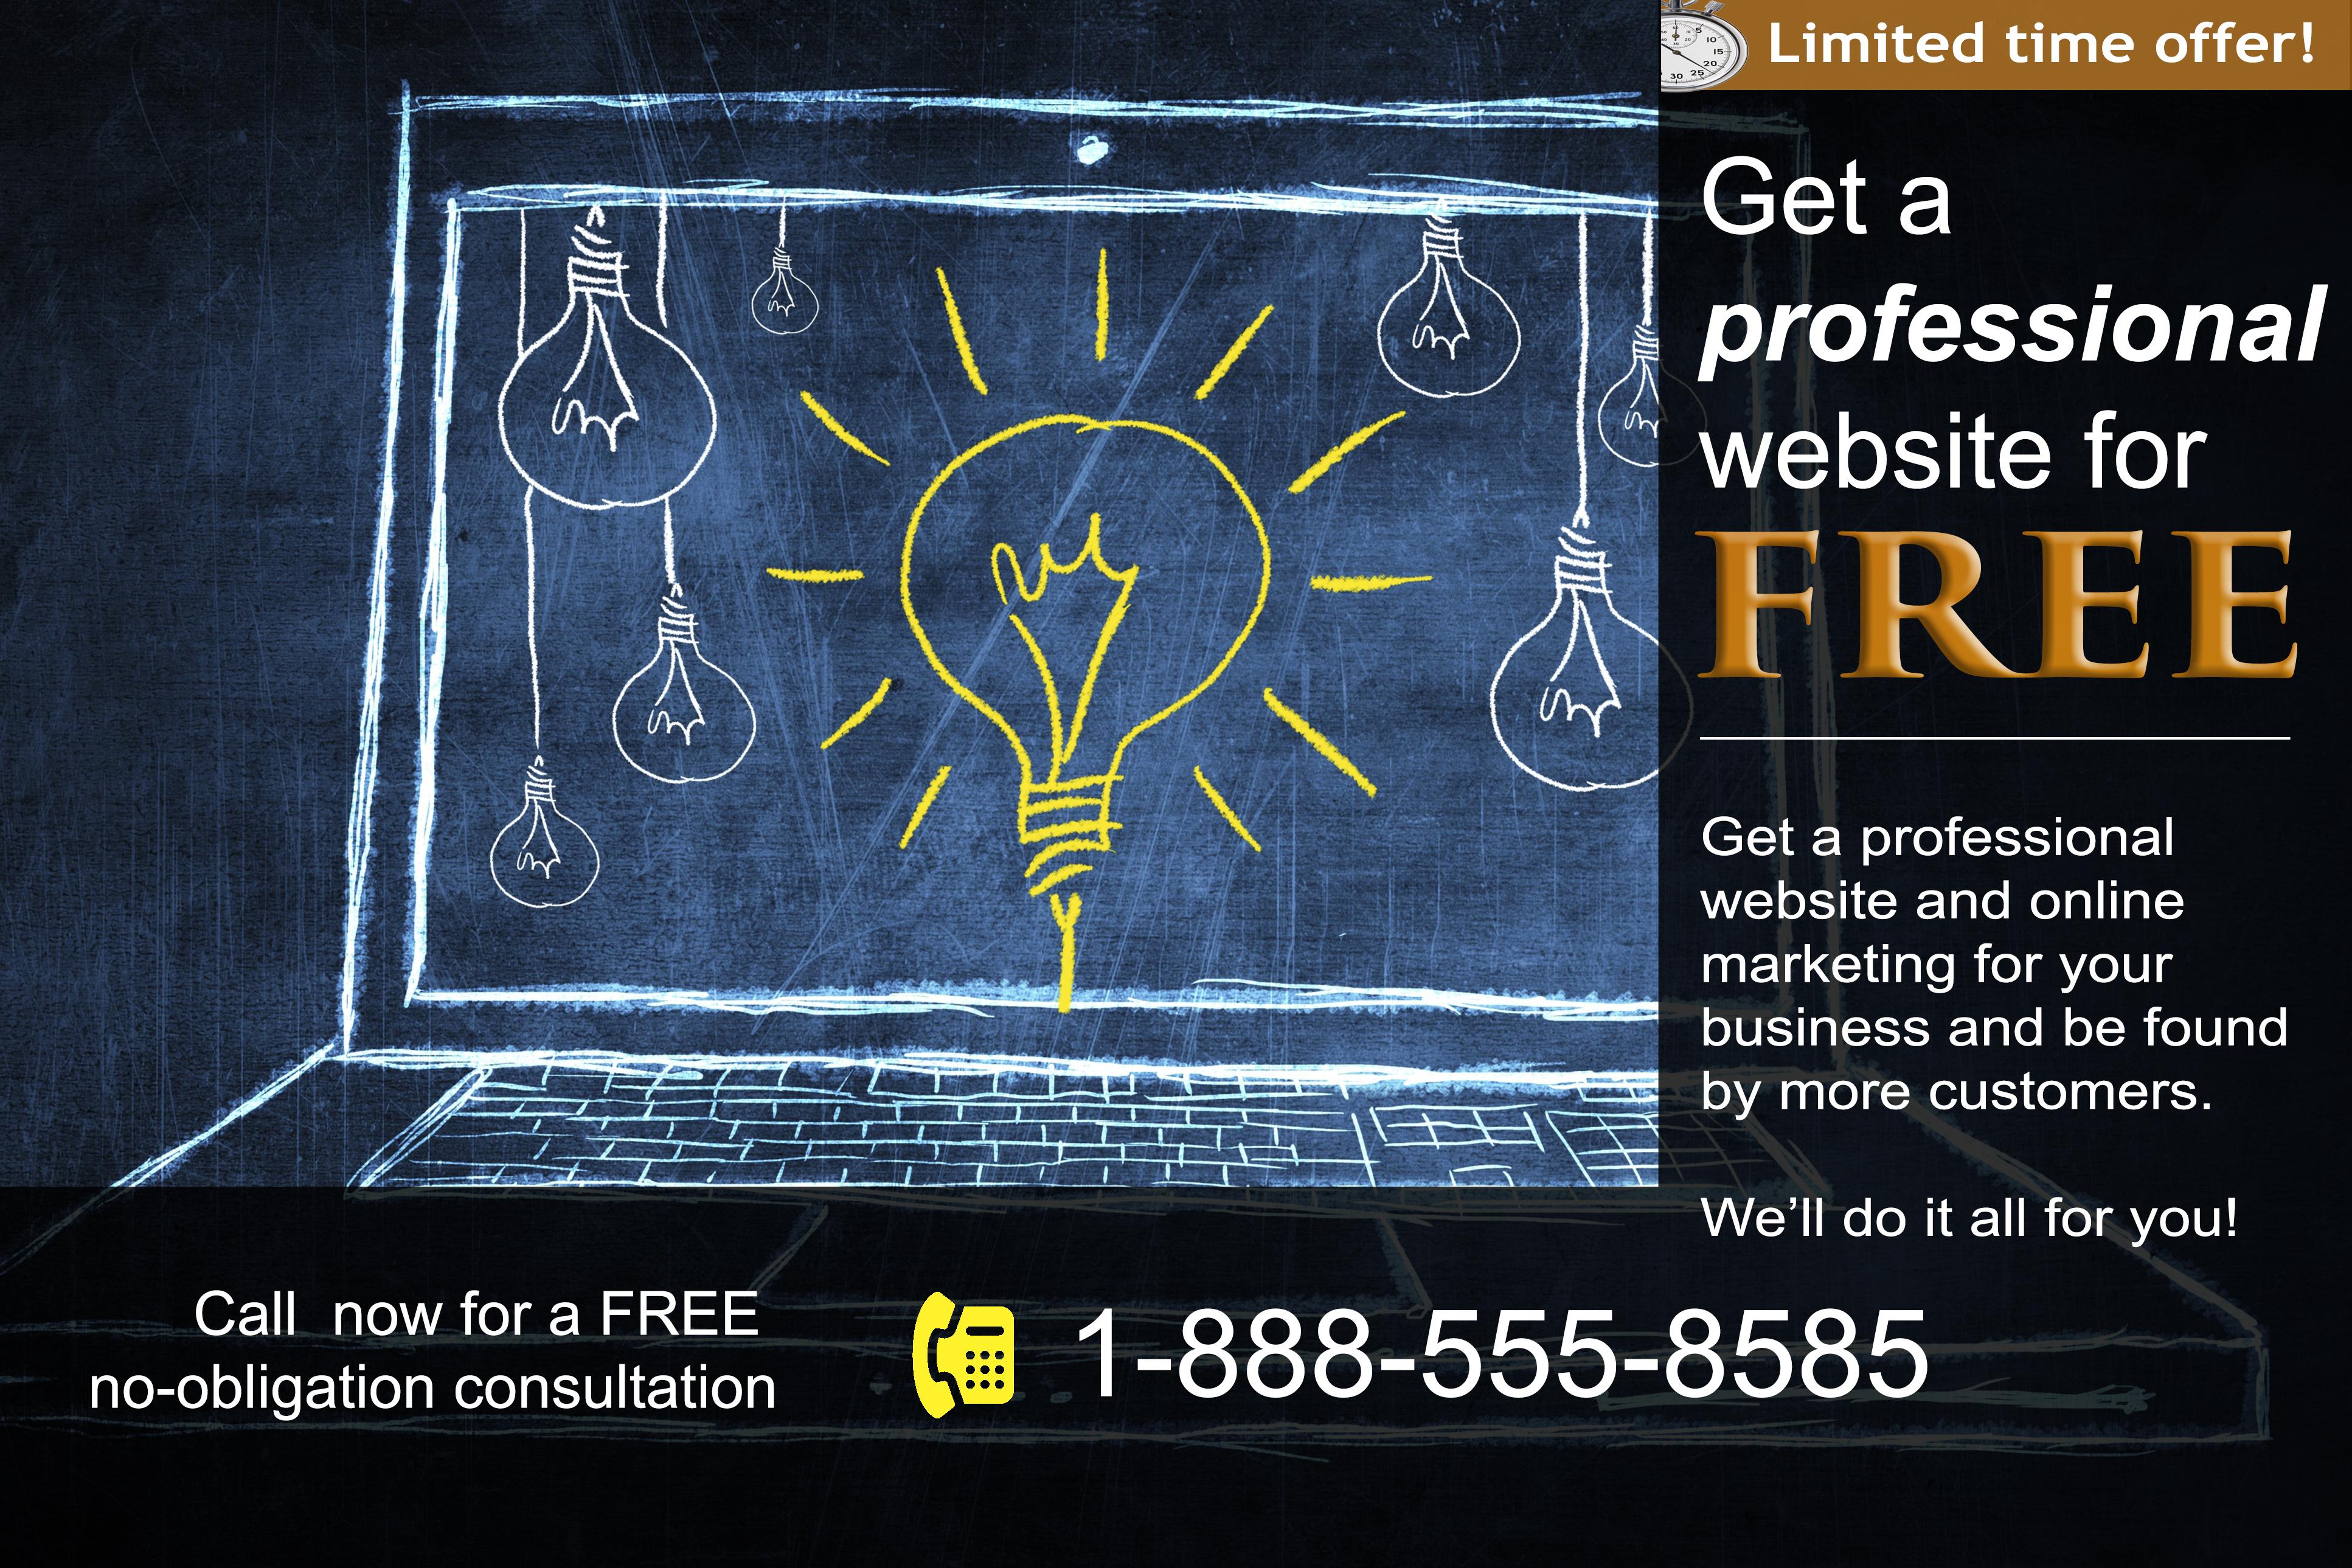 Free website ad